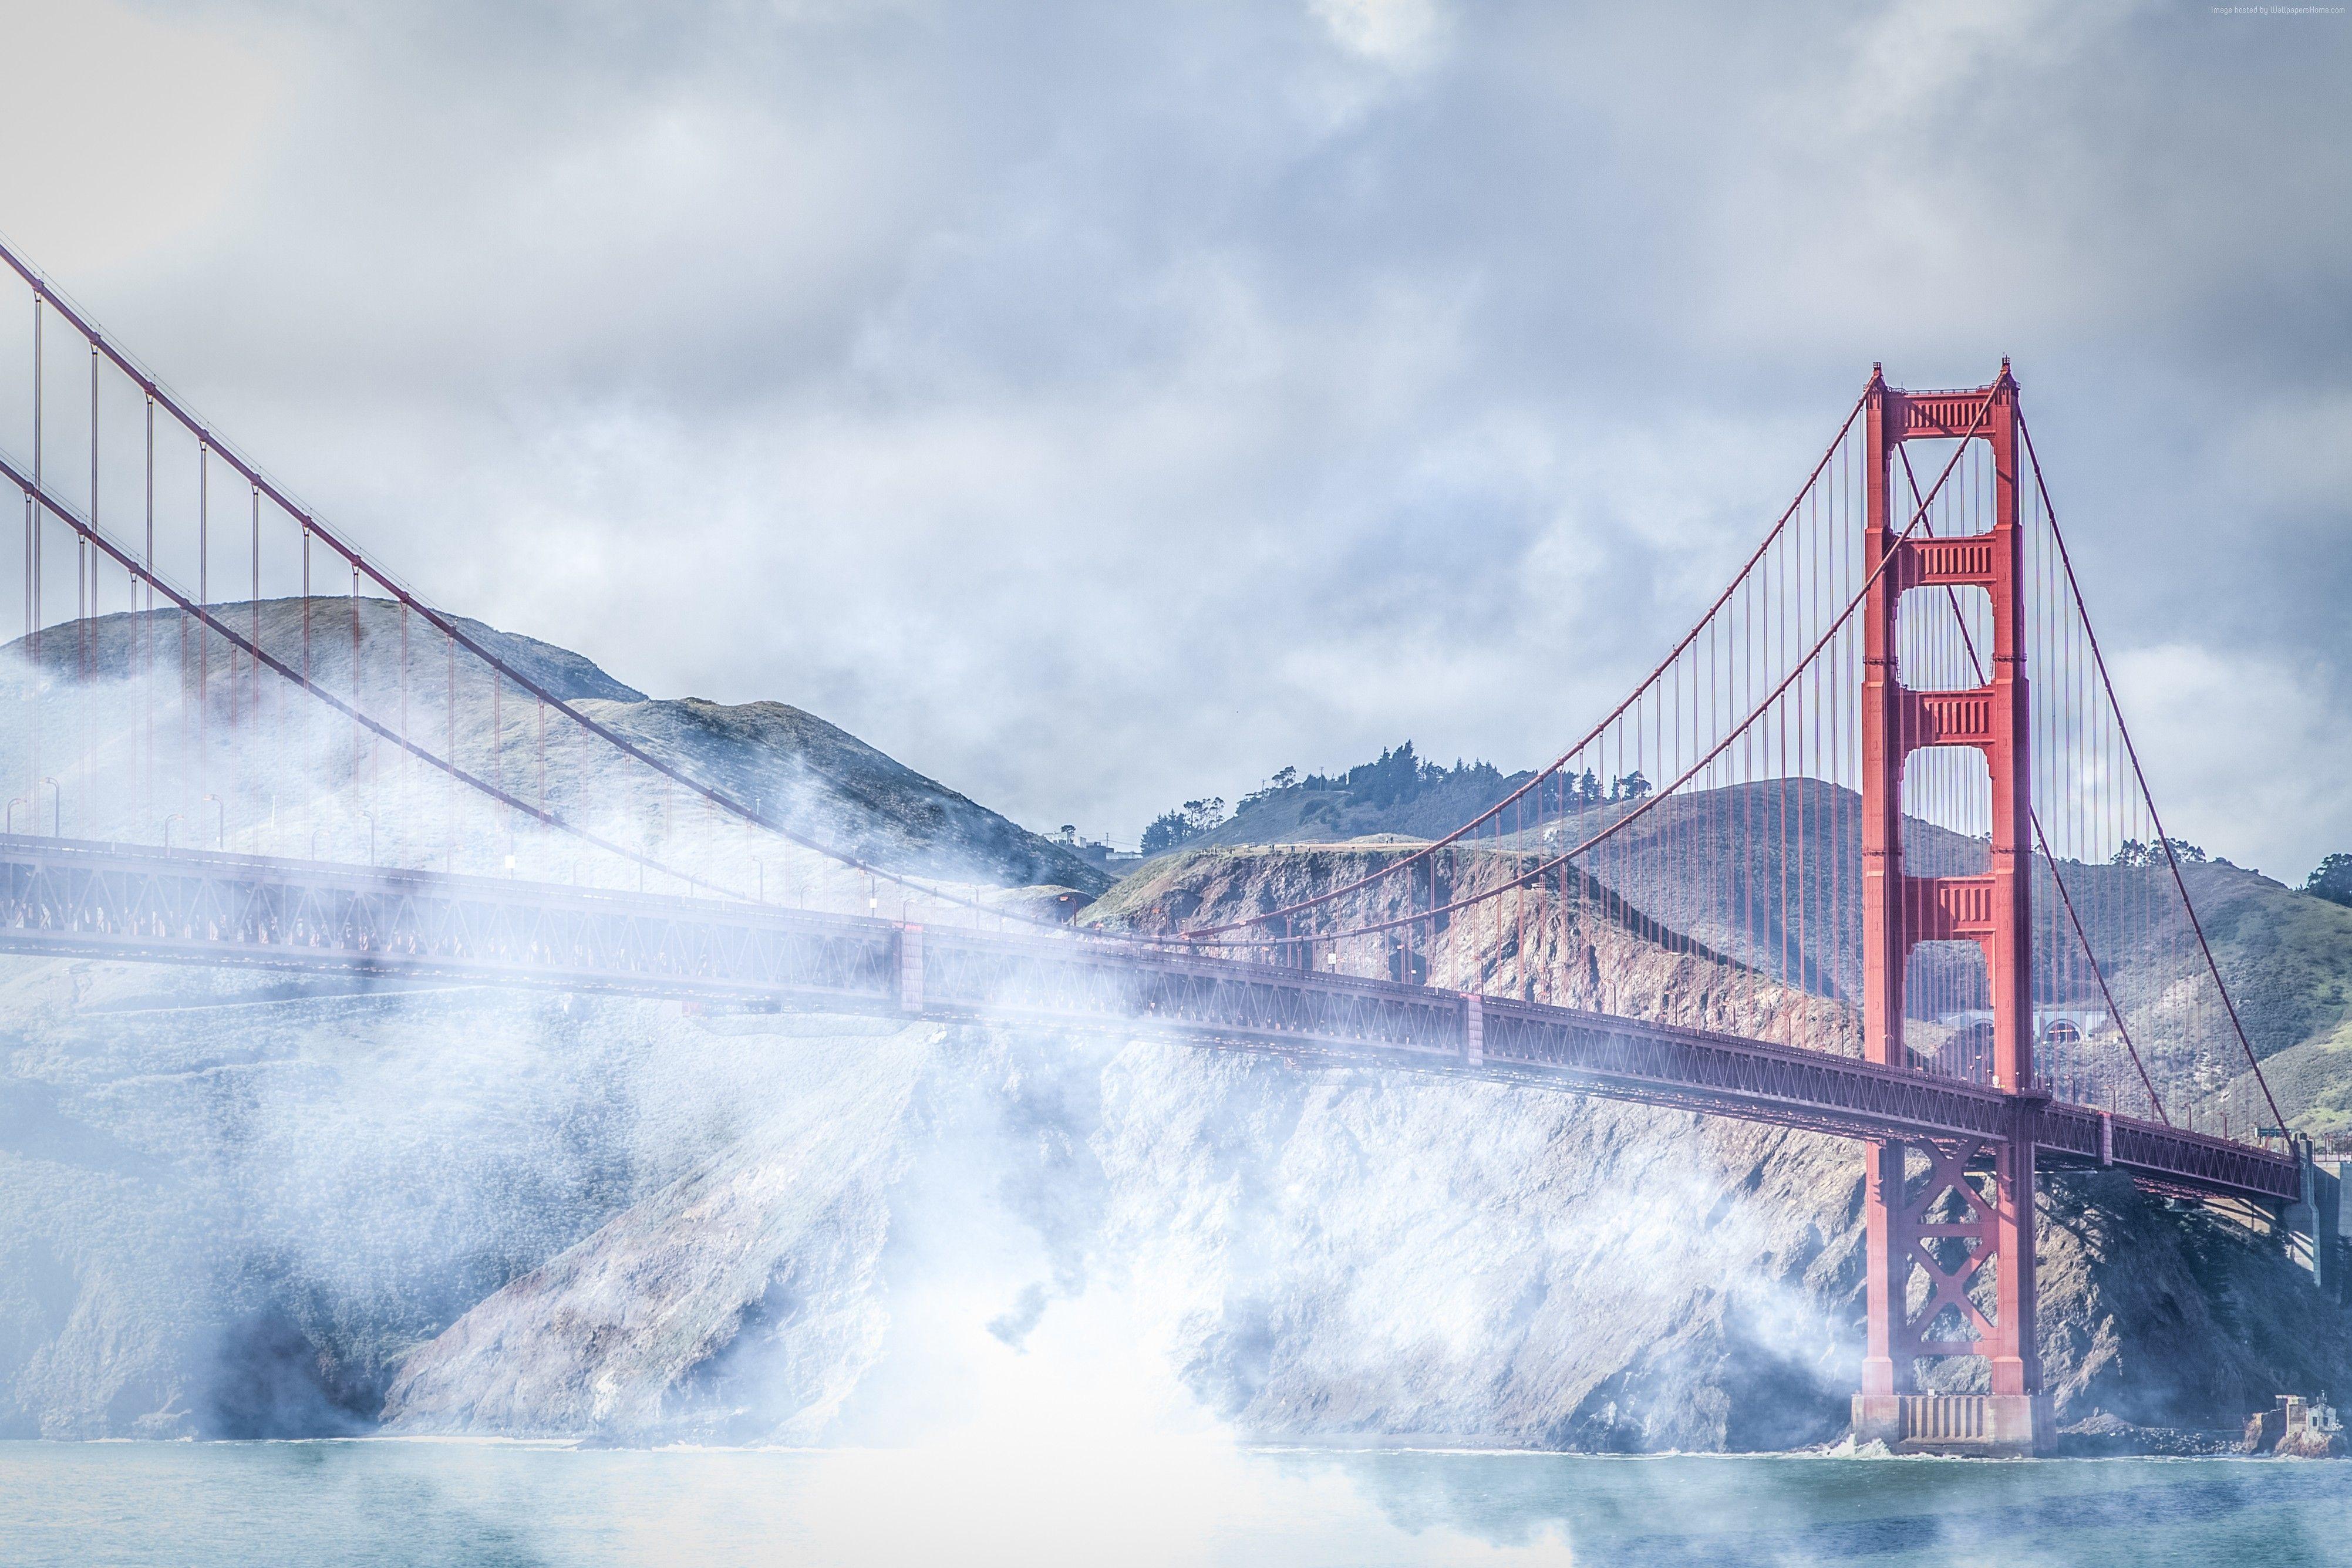 Golden Gate Bridge in Clouds Wallpaper HD Wallpaper